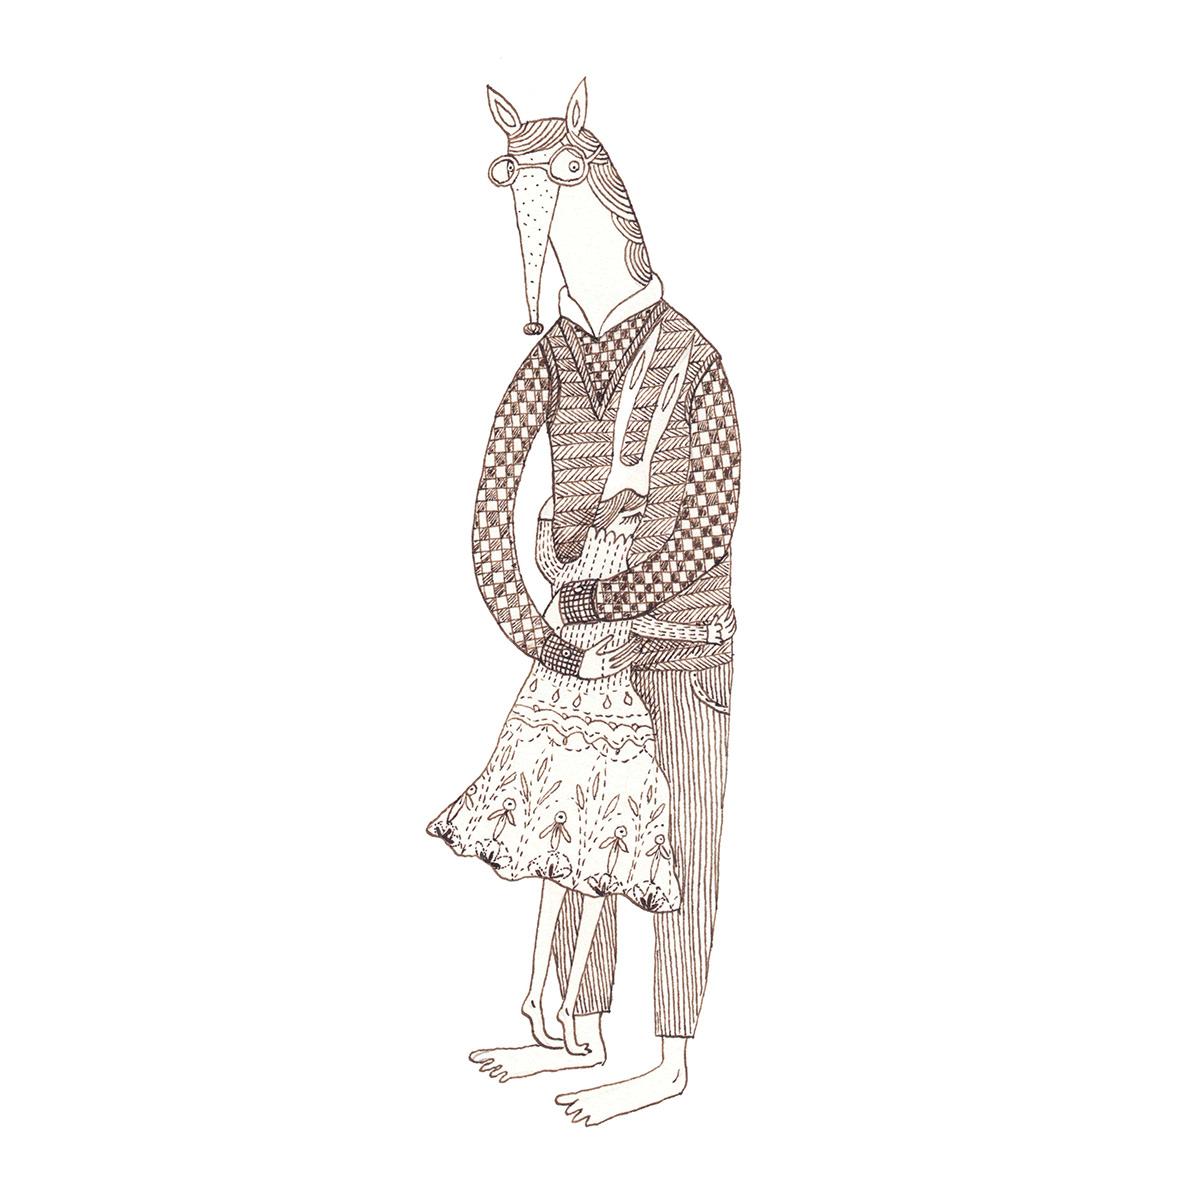 Veronica Neacsu Love short story romanian illustrator ink drawing monochrome illustration ILLUSTRATION